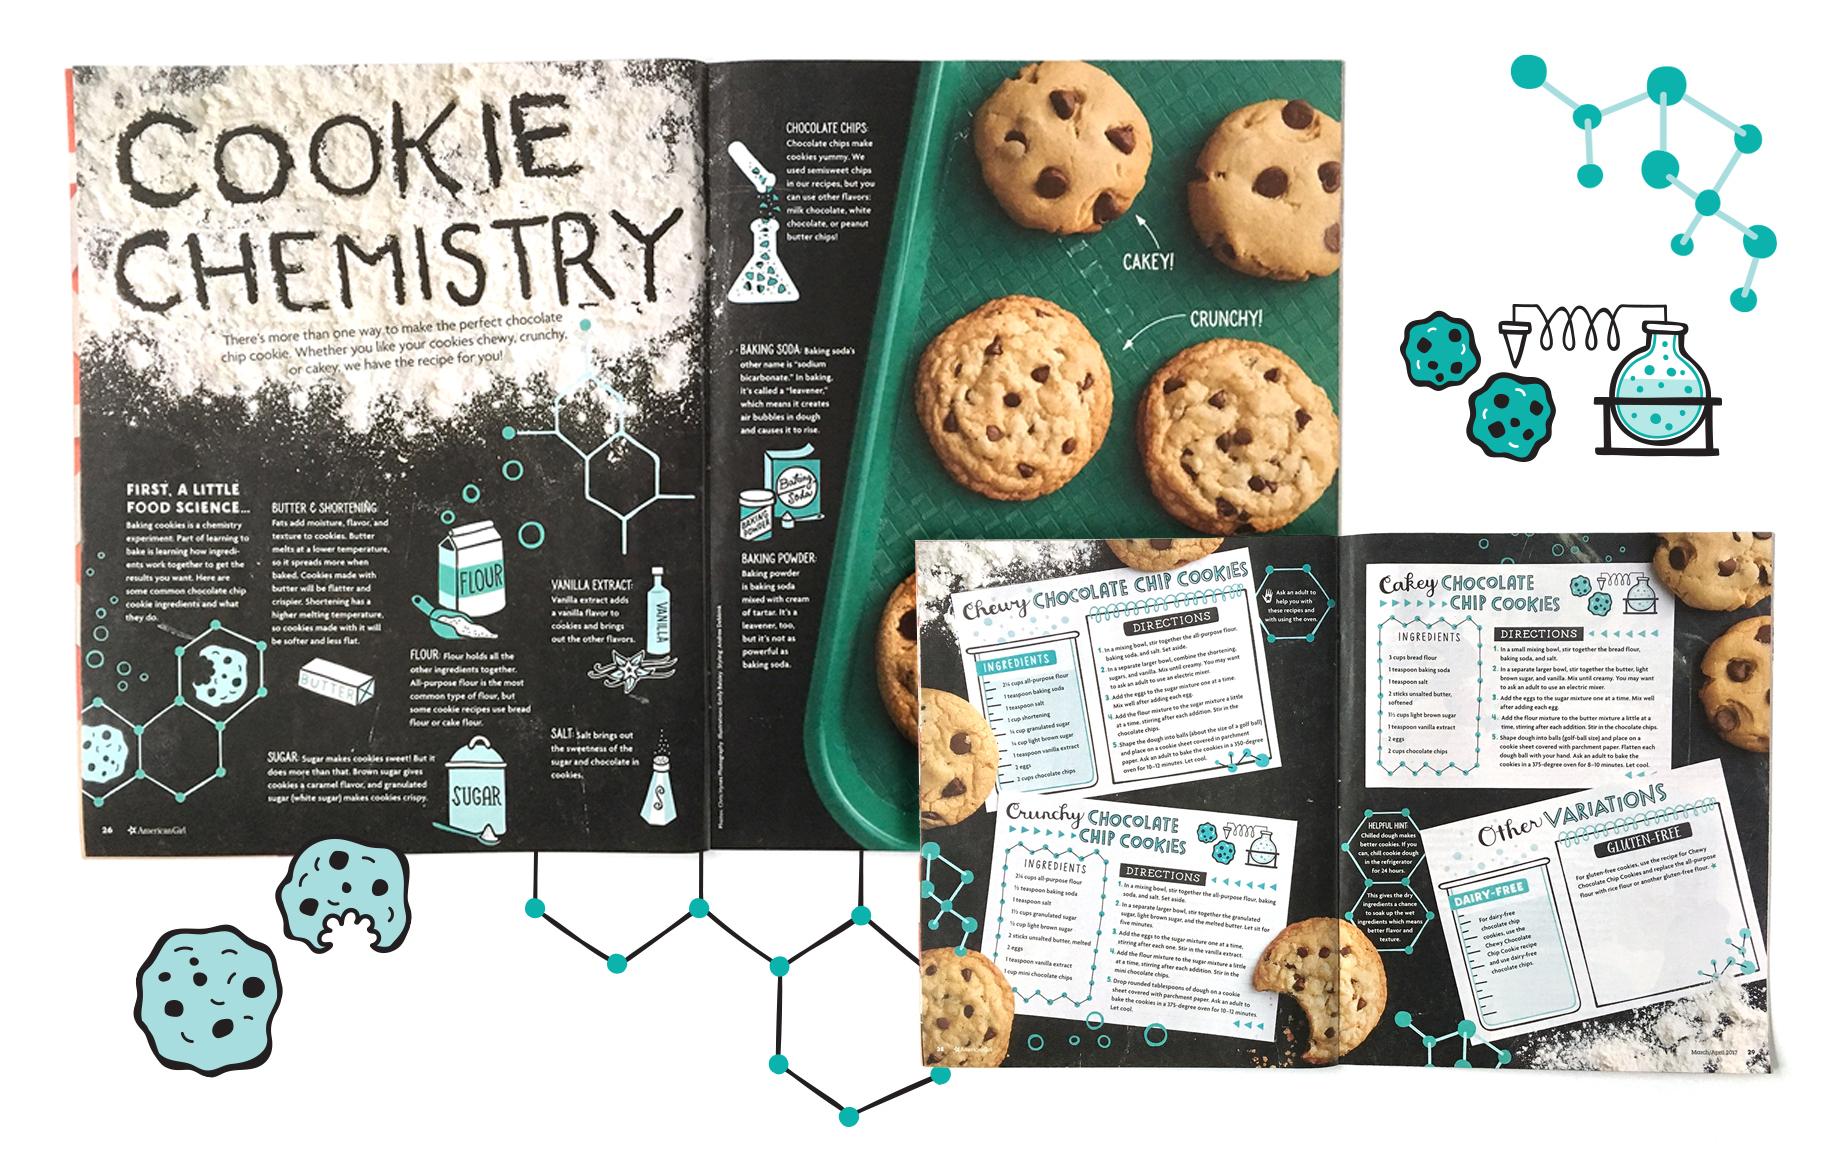 EB_AG_CookieChemistry.jpg